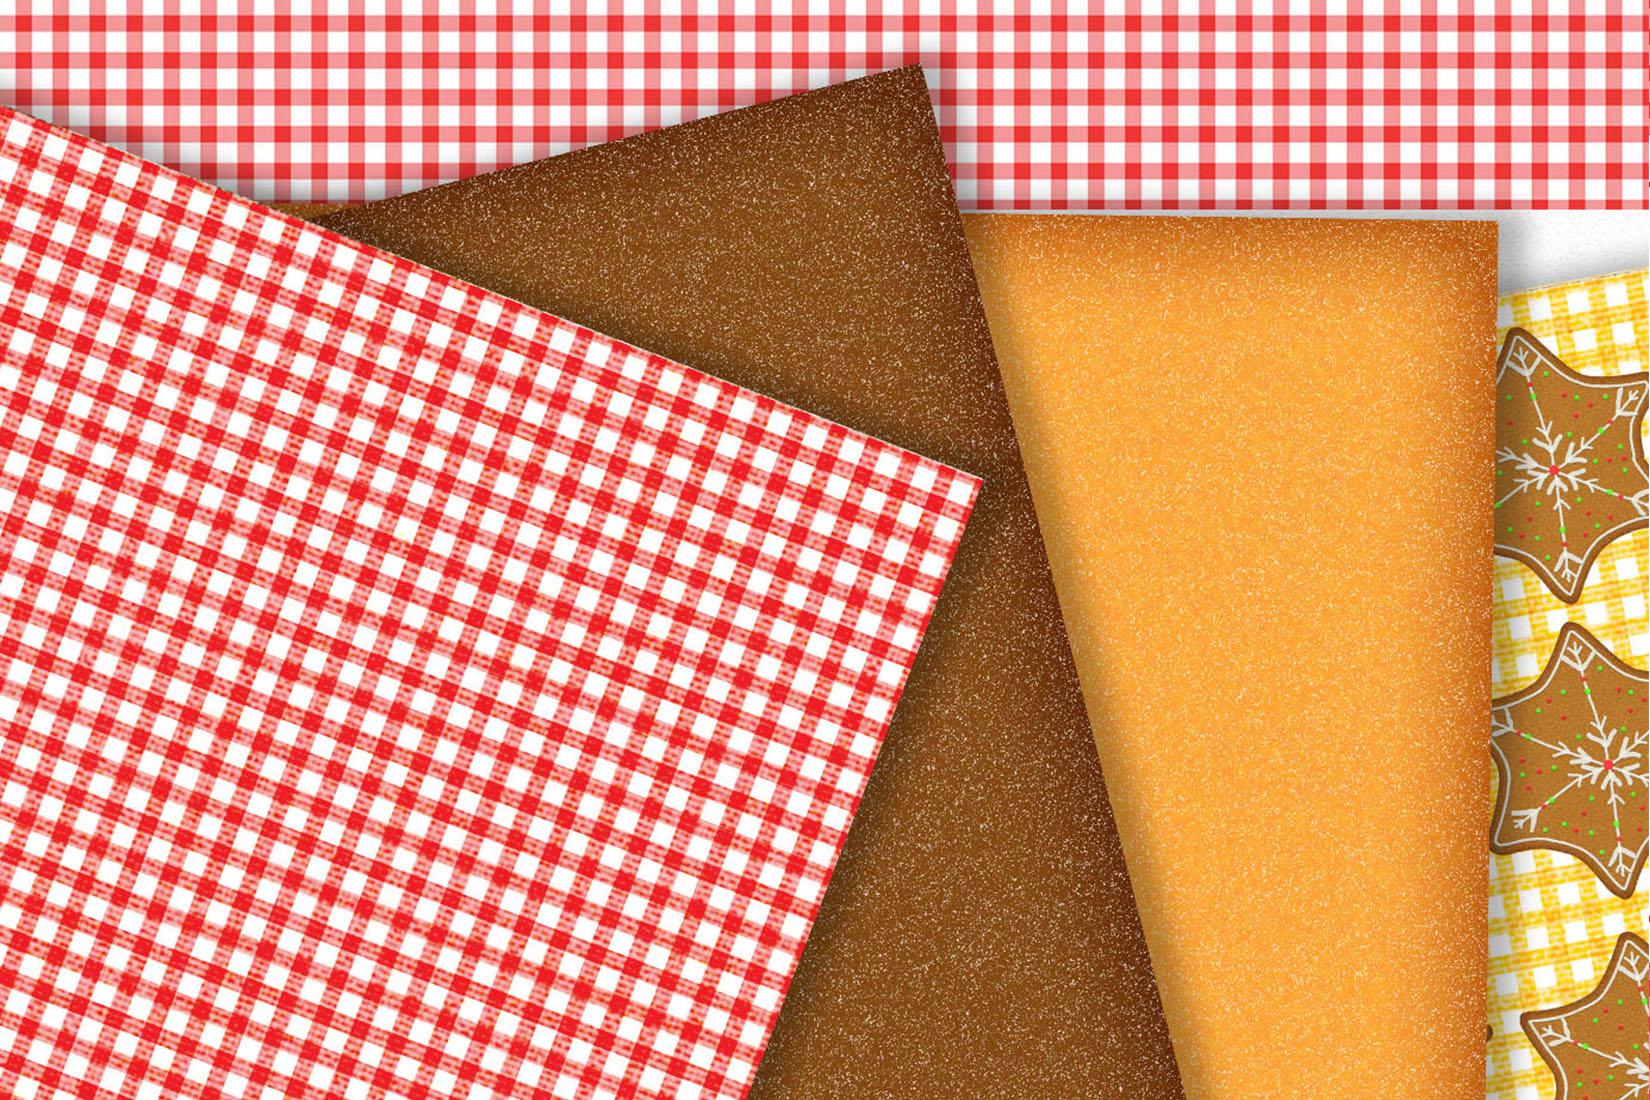 Gingerman Design Bundle - Letters, Numbers, Illustrations example image 3